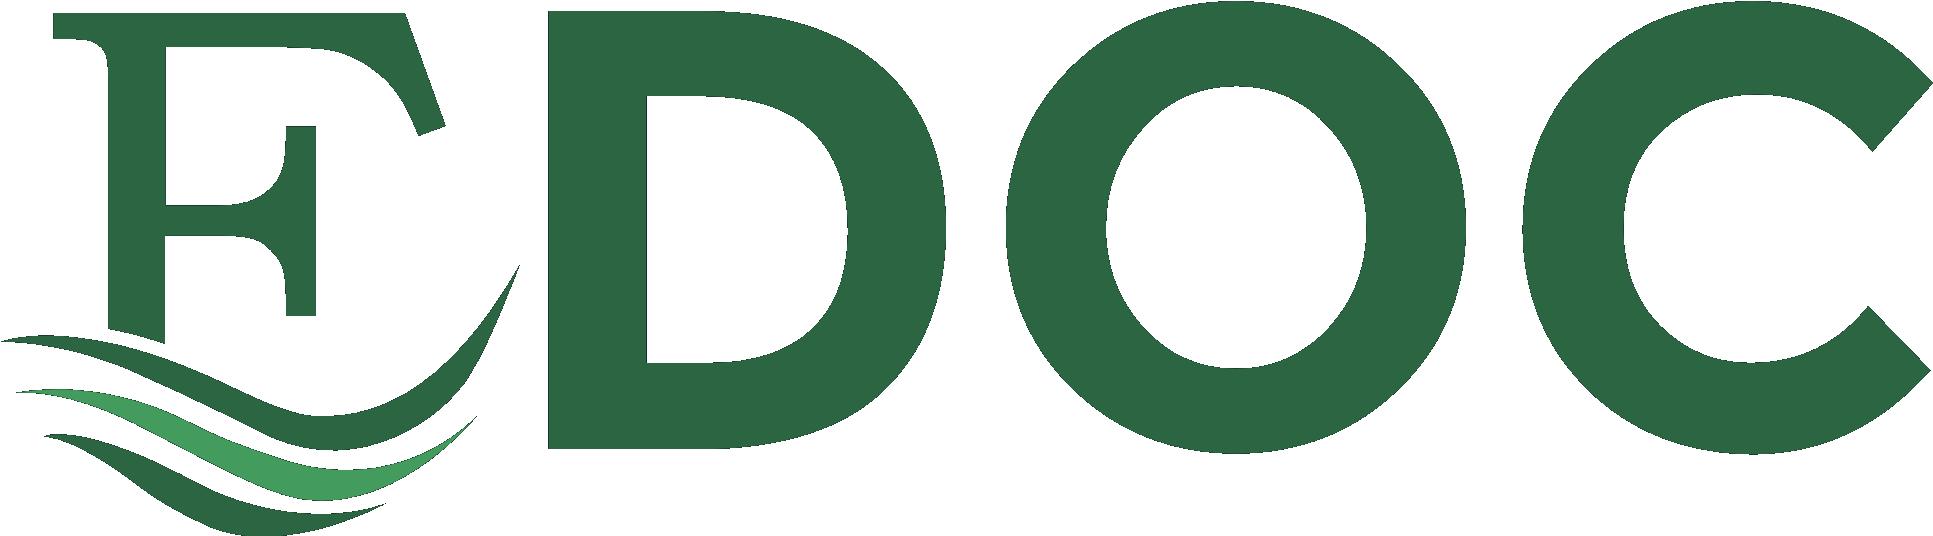 (DOC) Chase Revel Medicamente Miraculoase   Vio Neagu - coboramlaprima.ro